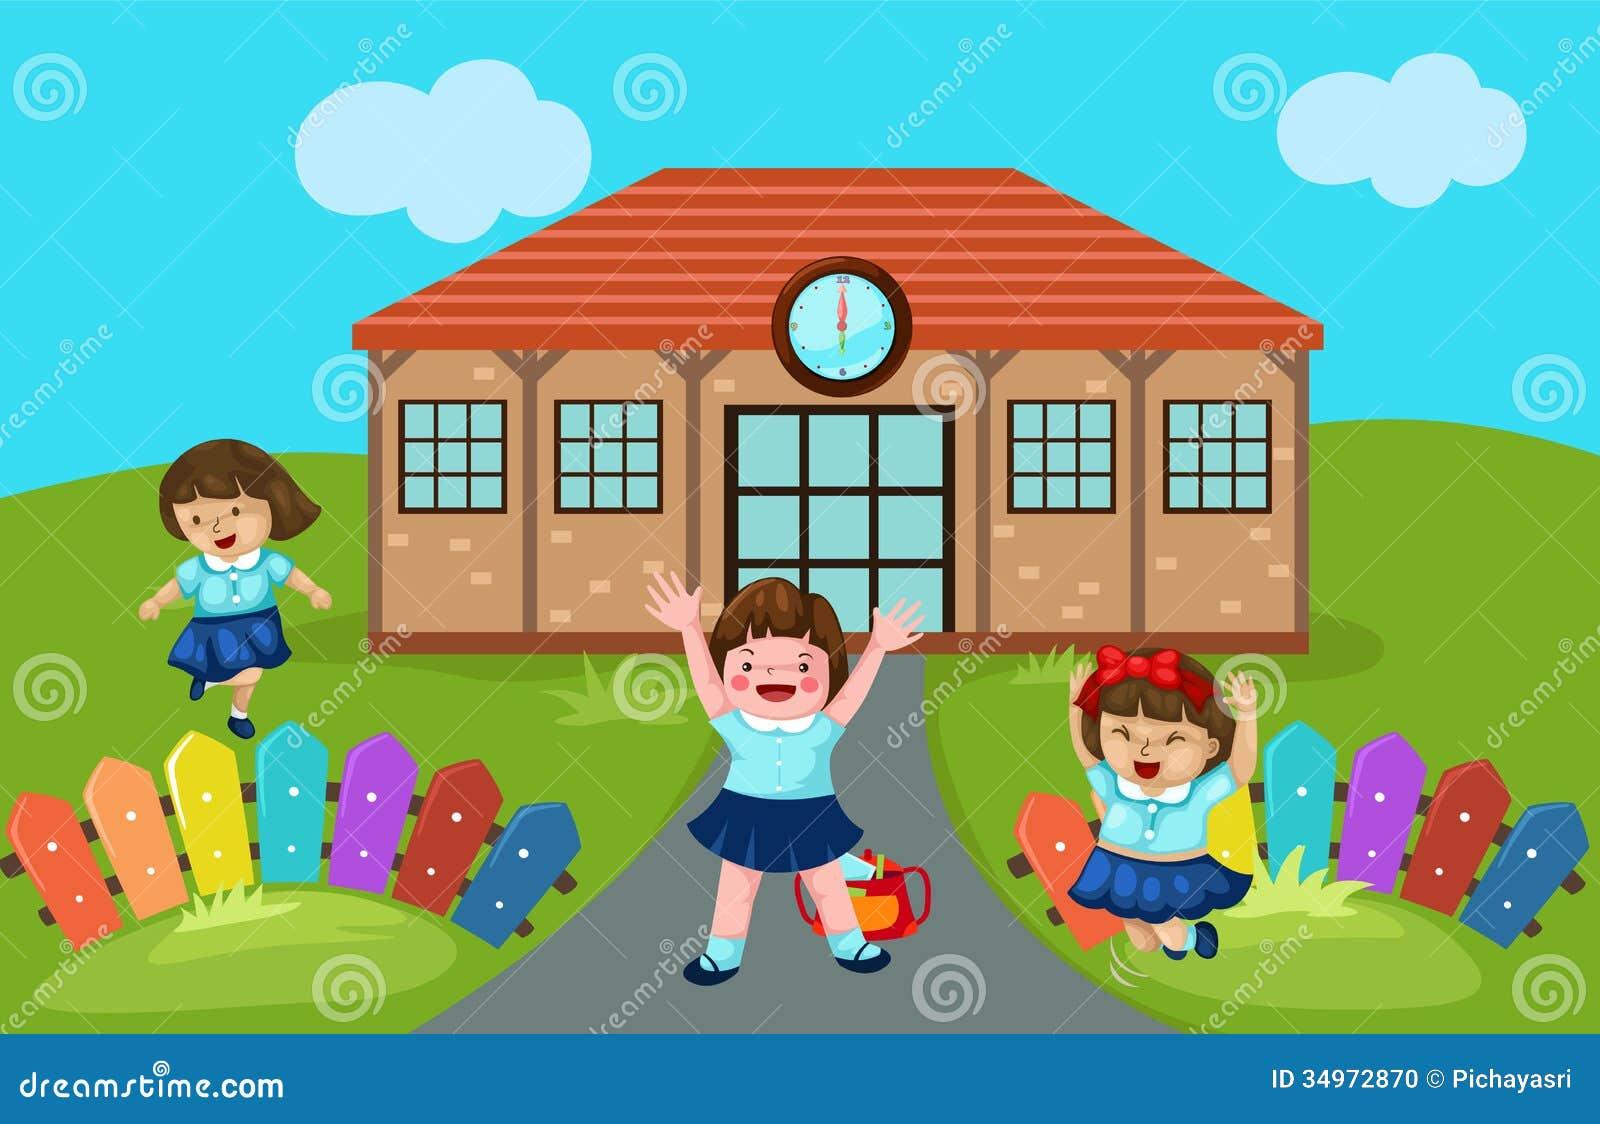 Home Design Game Id Cute Kindergarten At School Stock Vector Illustration Of